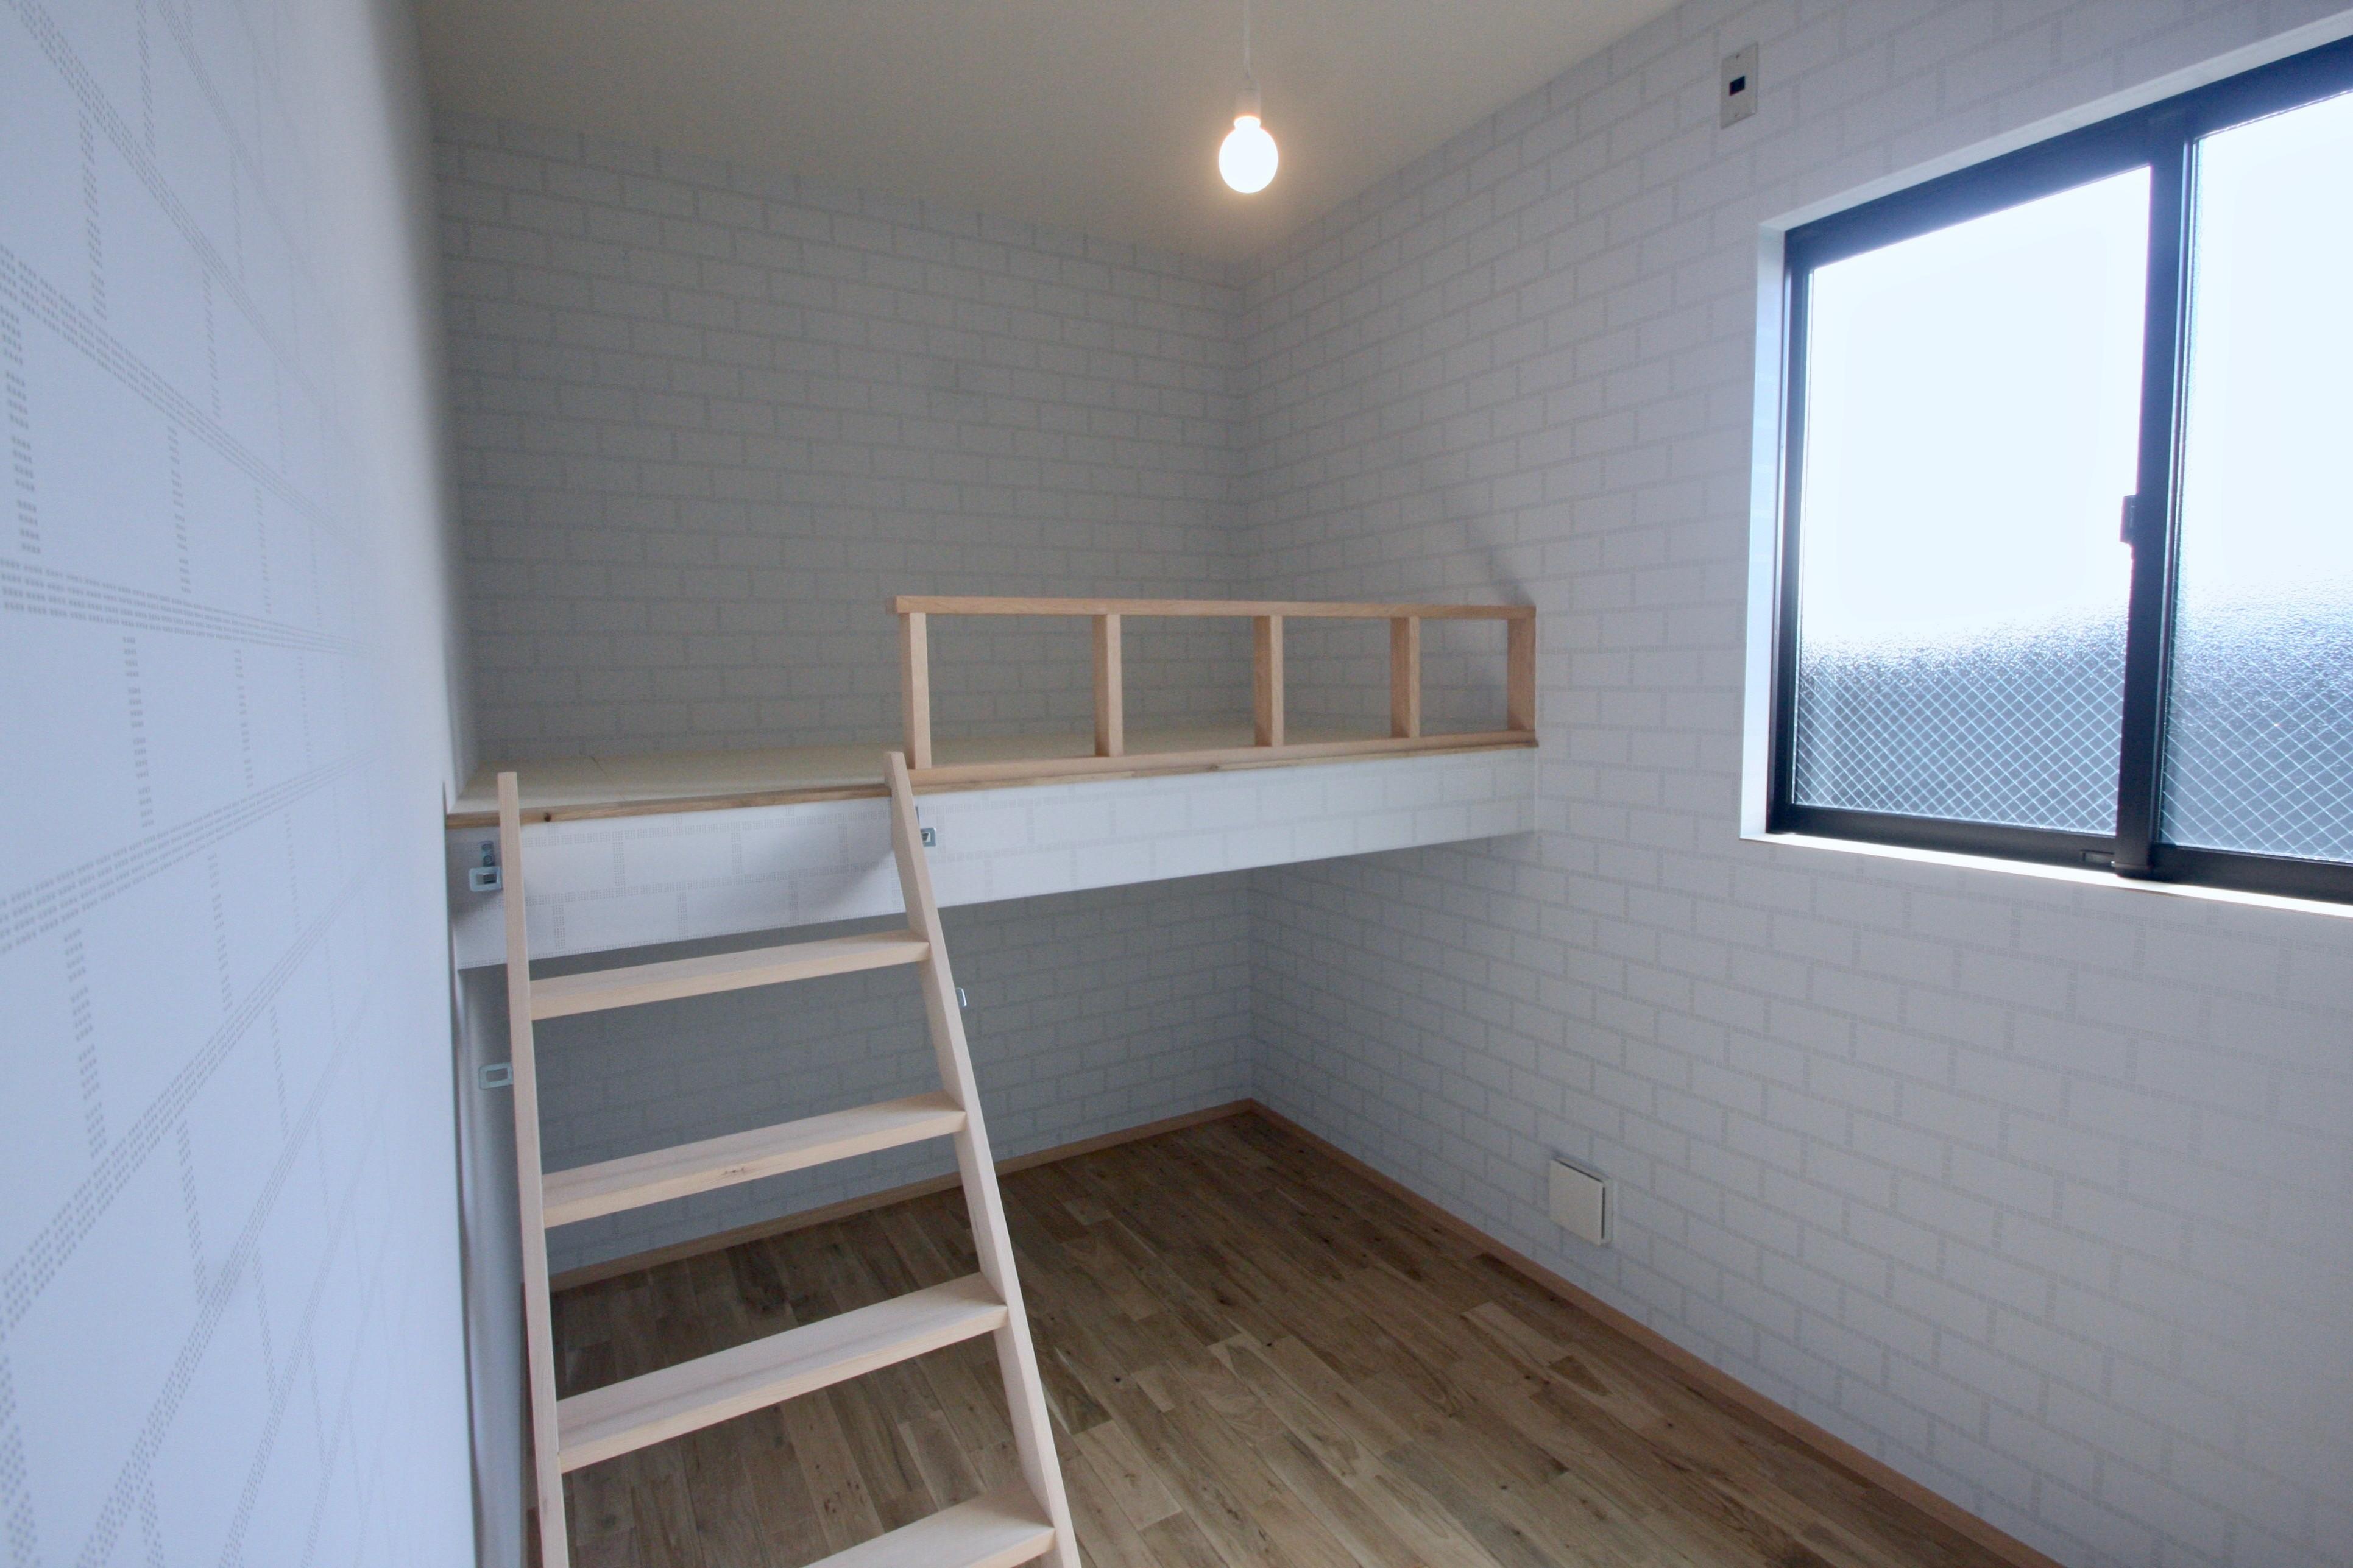 子供部屋事例:2階子供部屋(三国の住宅:大阪のデザイン住宅 3階建て)